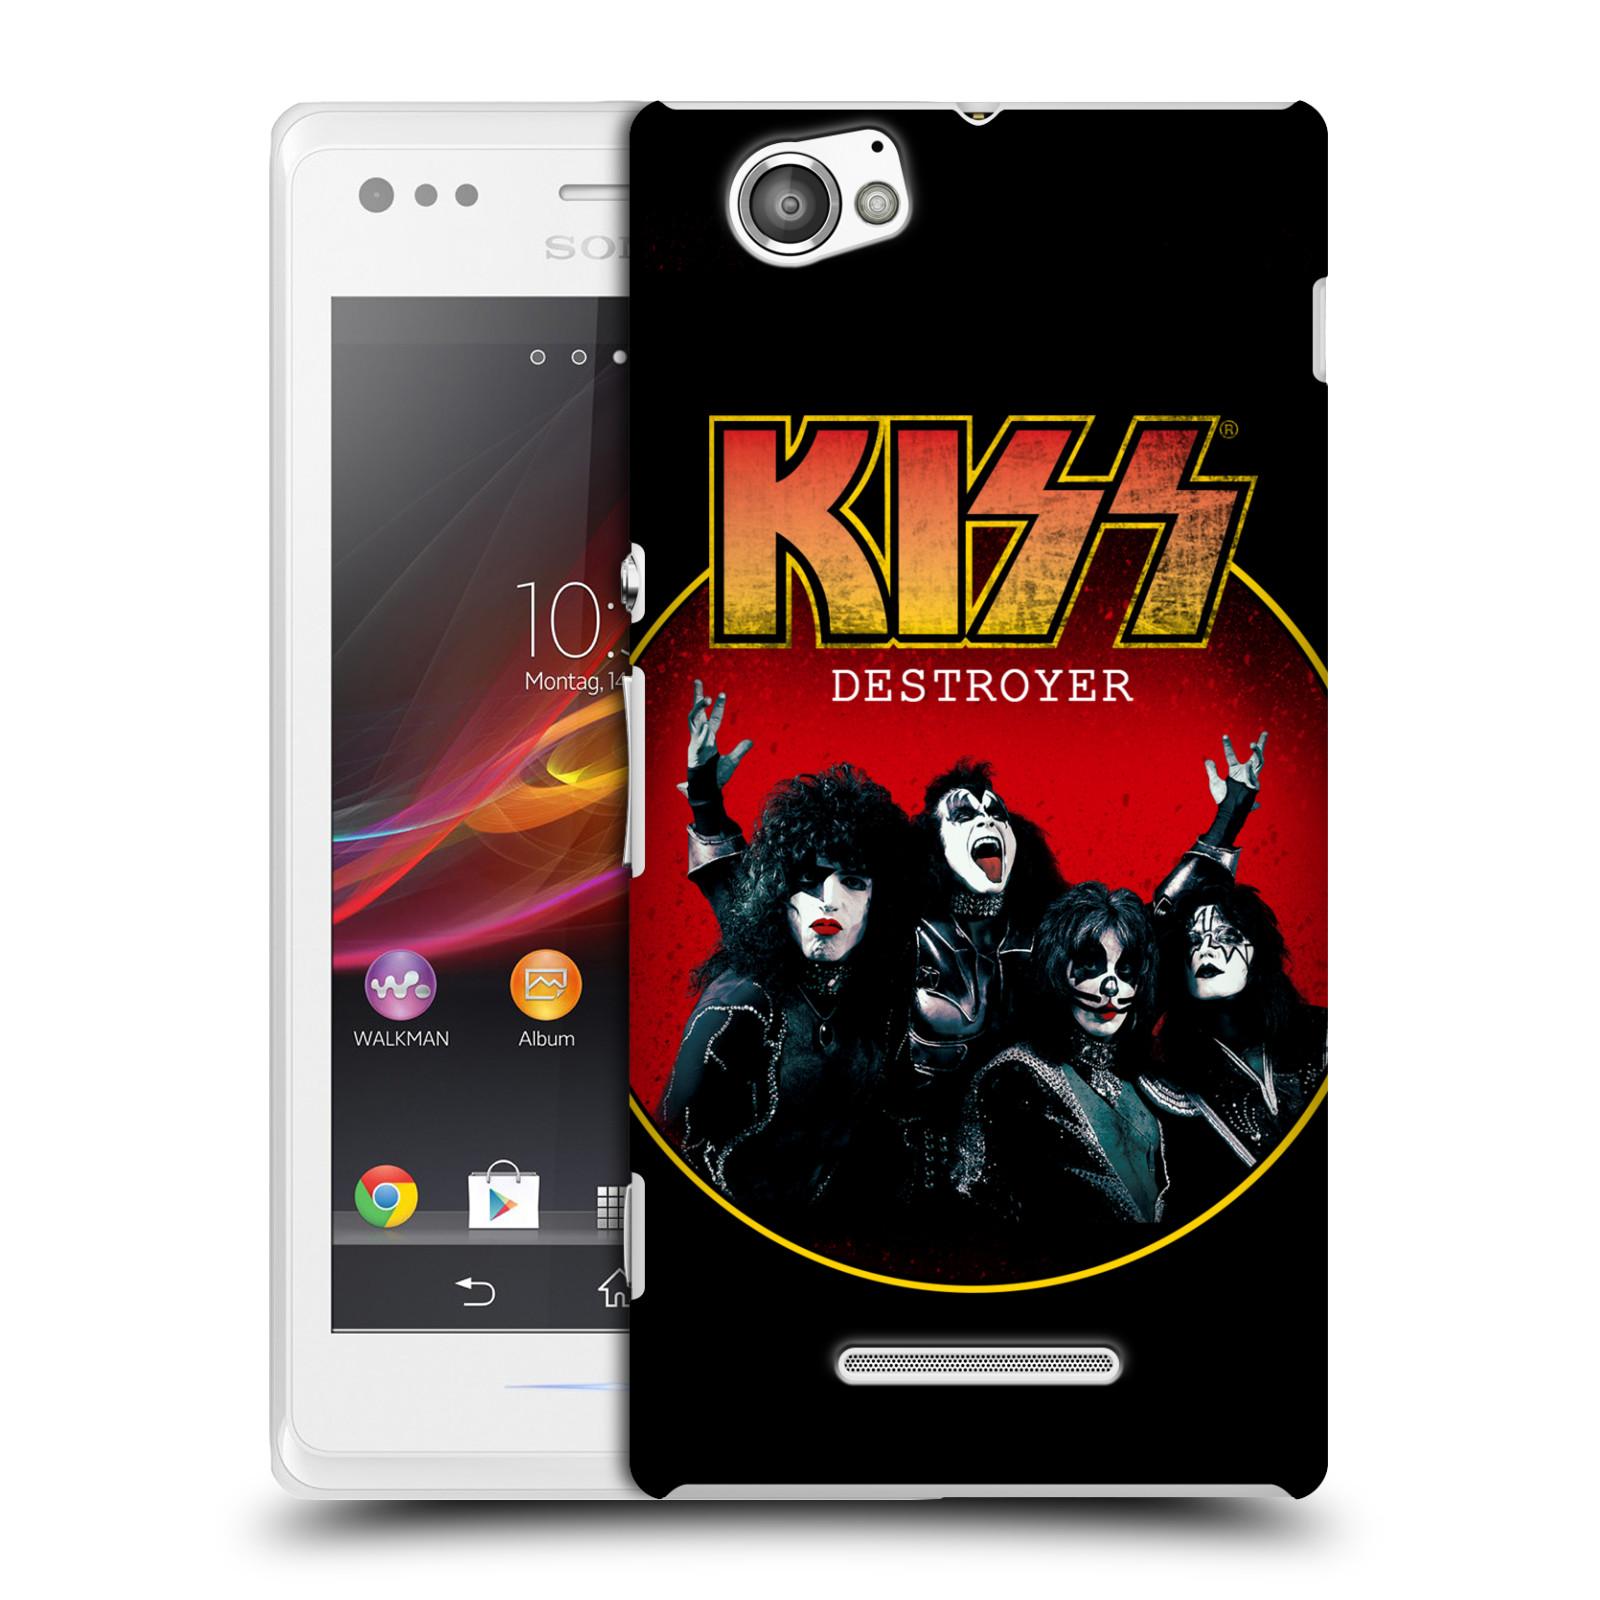 Plastové pouzdro na mobil Sony Xperia M C1905 HEAD CASE - Kiss - Destroyer